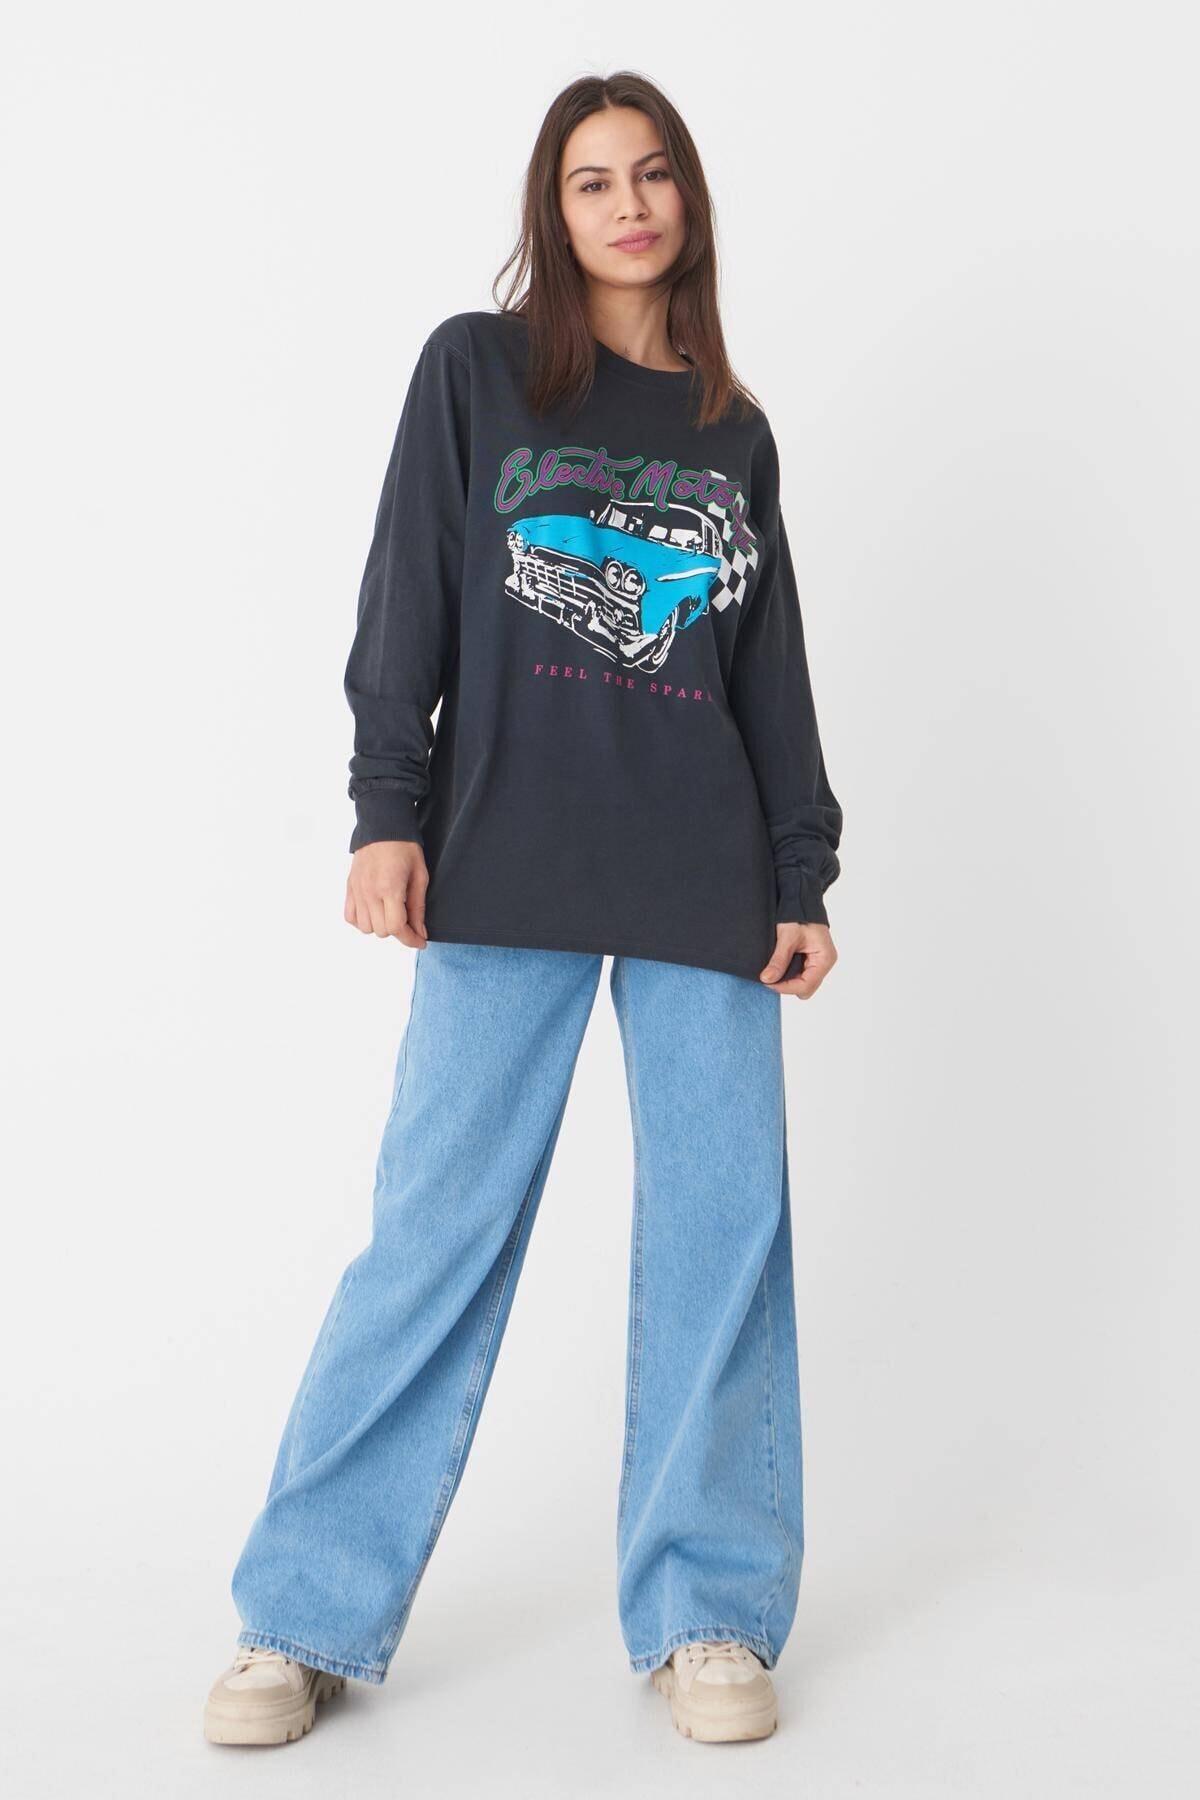 Addax Kadın Füme Baskılı Sweatshirt 1